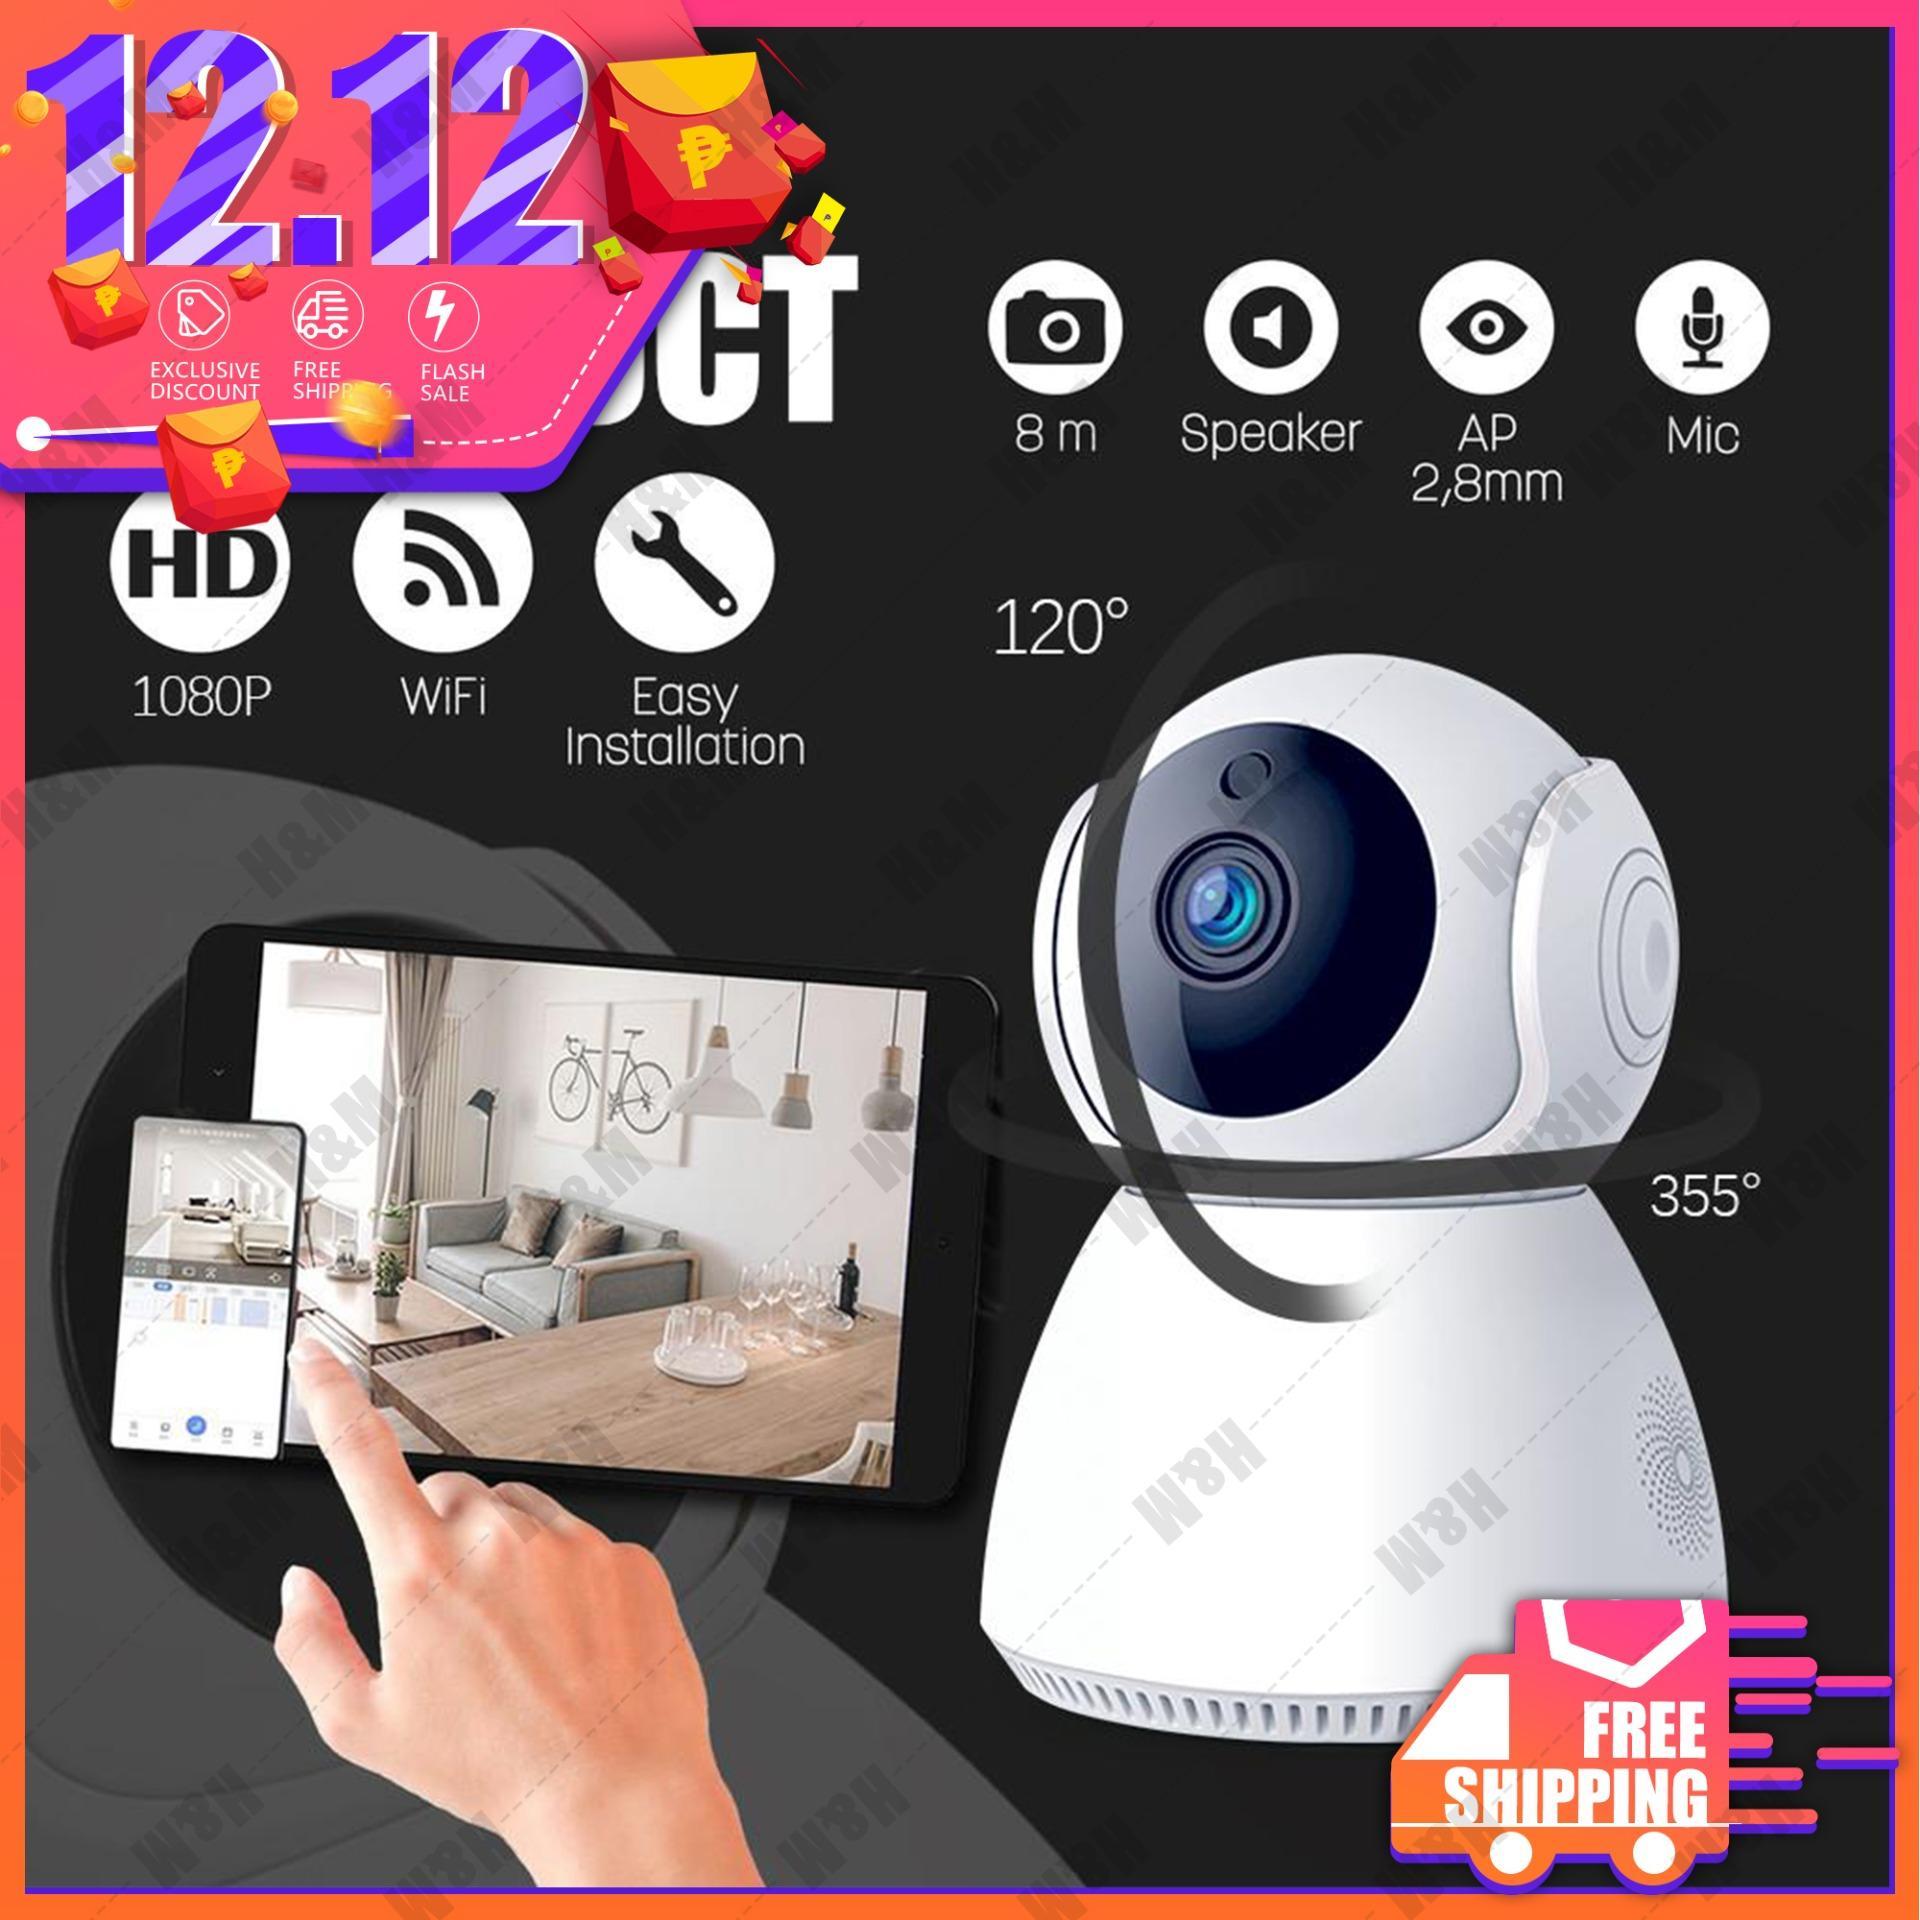 ✅Hot Selling CCTV 1080P Home Security IP Camera HD WiFi Camera Wireless ip  cam IP Security Cameras Supports external 64GB MicroSD card